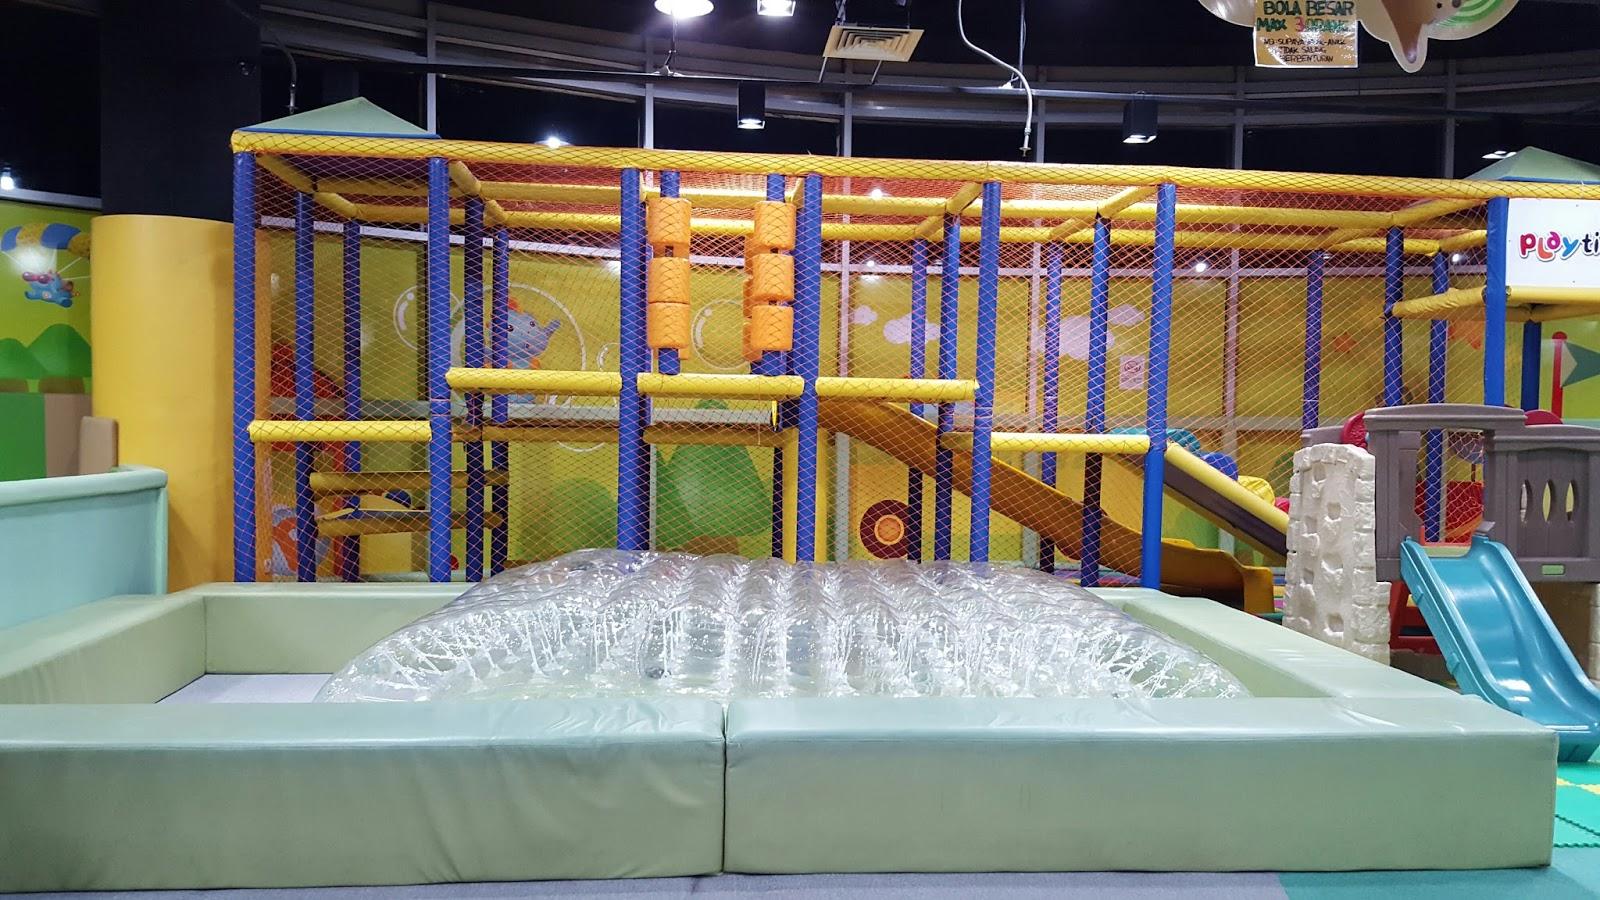 Kids Indoor Playground Playtime Lottemart Bintaro Review